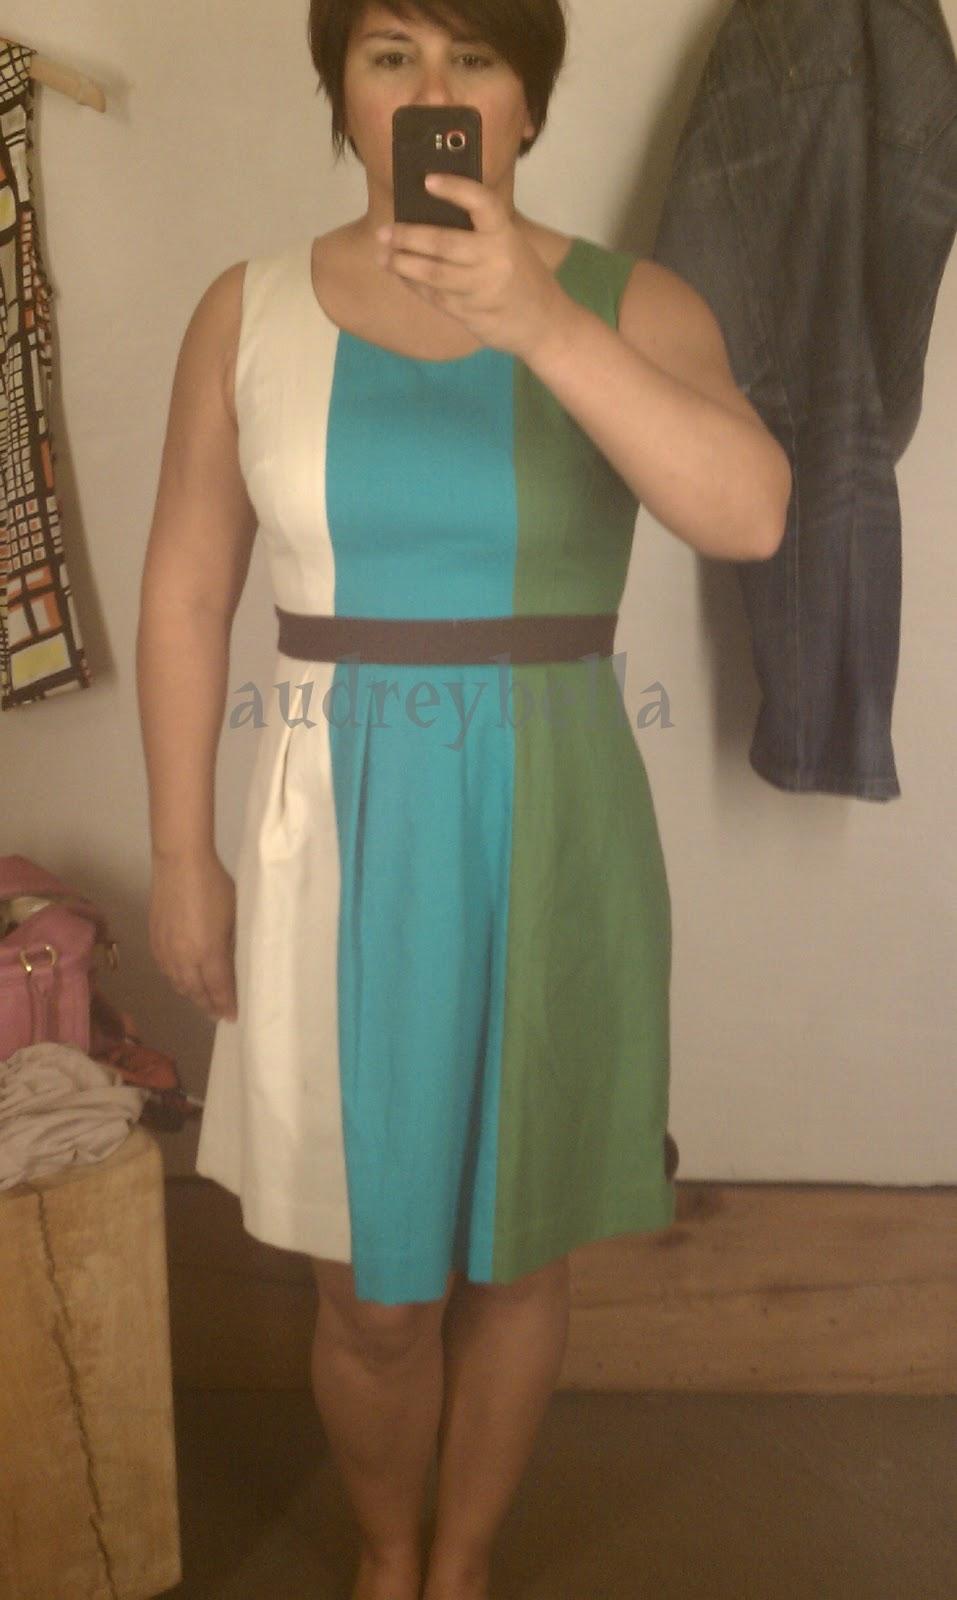 c51c21f06529 Glanz Dress – Size 8 – LOVE THIS DRESS!!! It's a perfect fit!